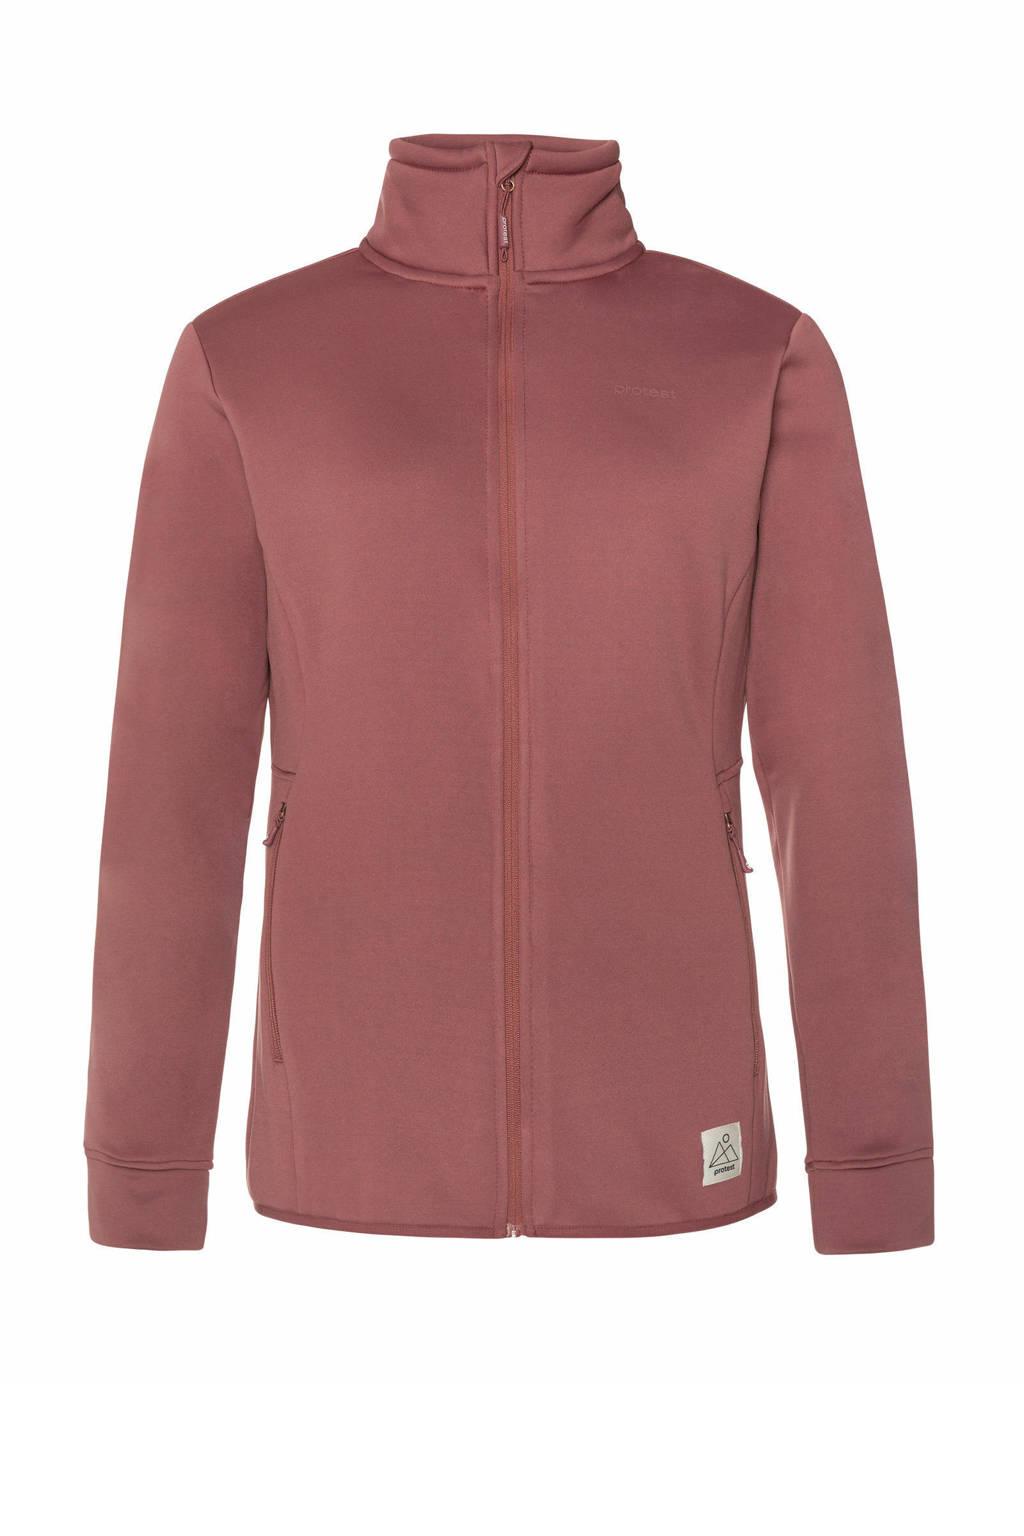 Protest outdoor fleece vest Kumae roze, Roze